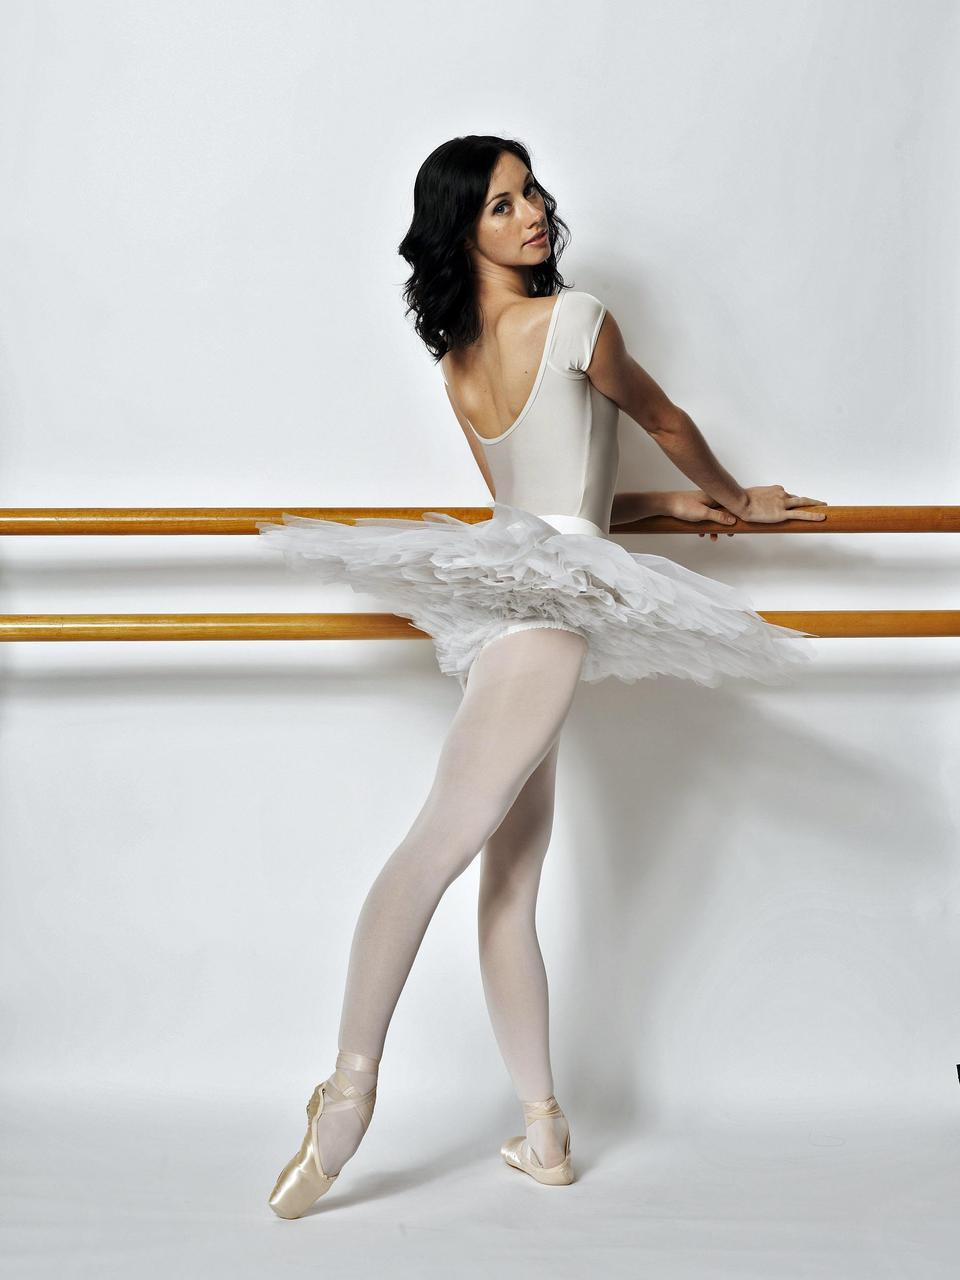 Blonde ballerina ballet barre fucking - 1 7